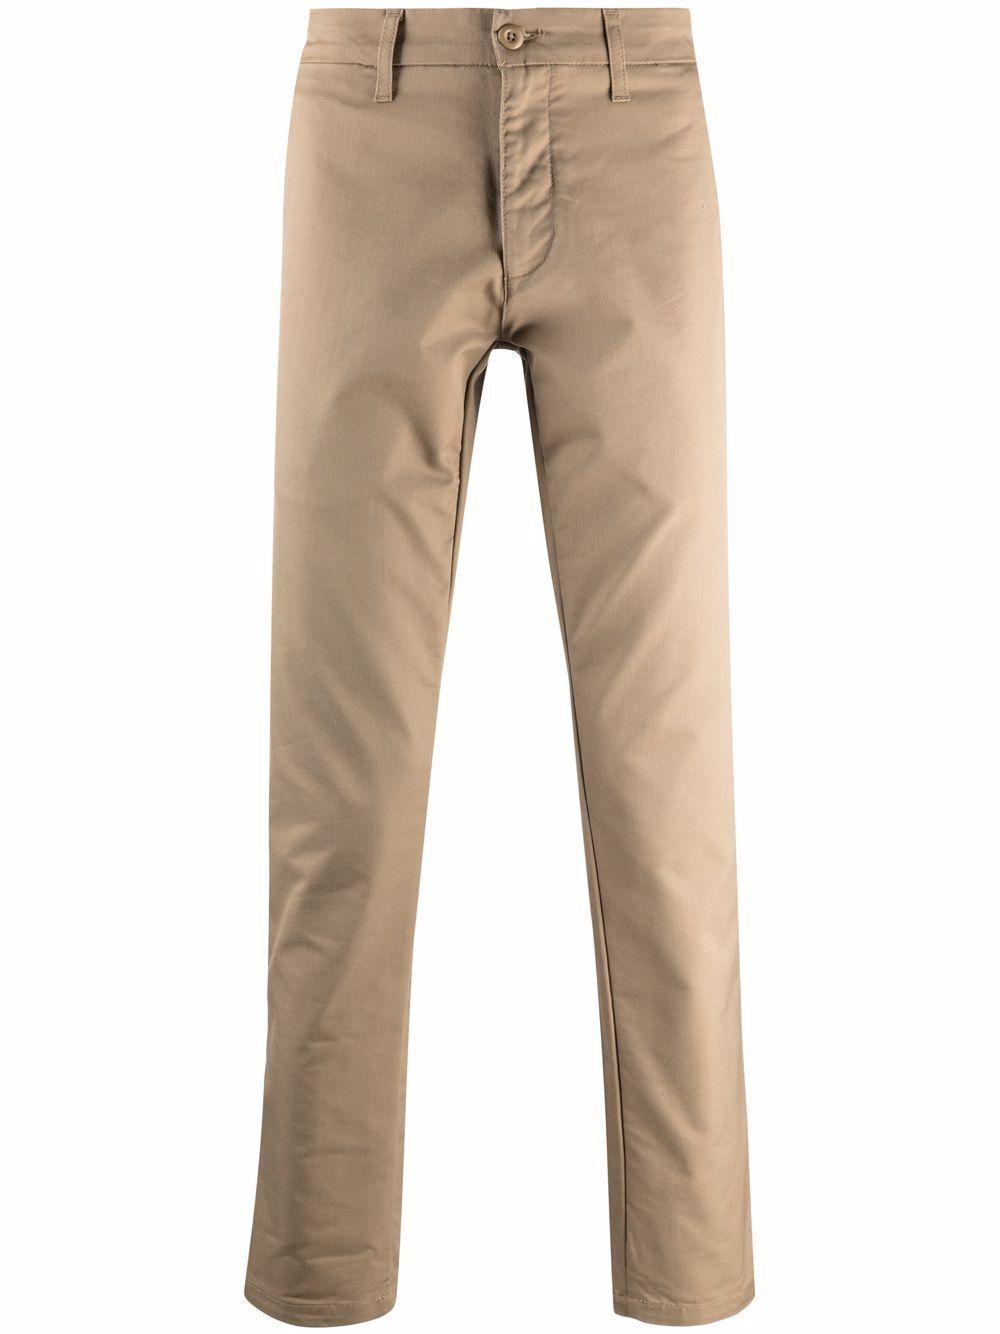 pantaloni sid uomo marroni in cotone CARHARTT WIP   Pantaloni   I0033678Y.02